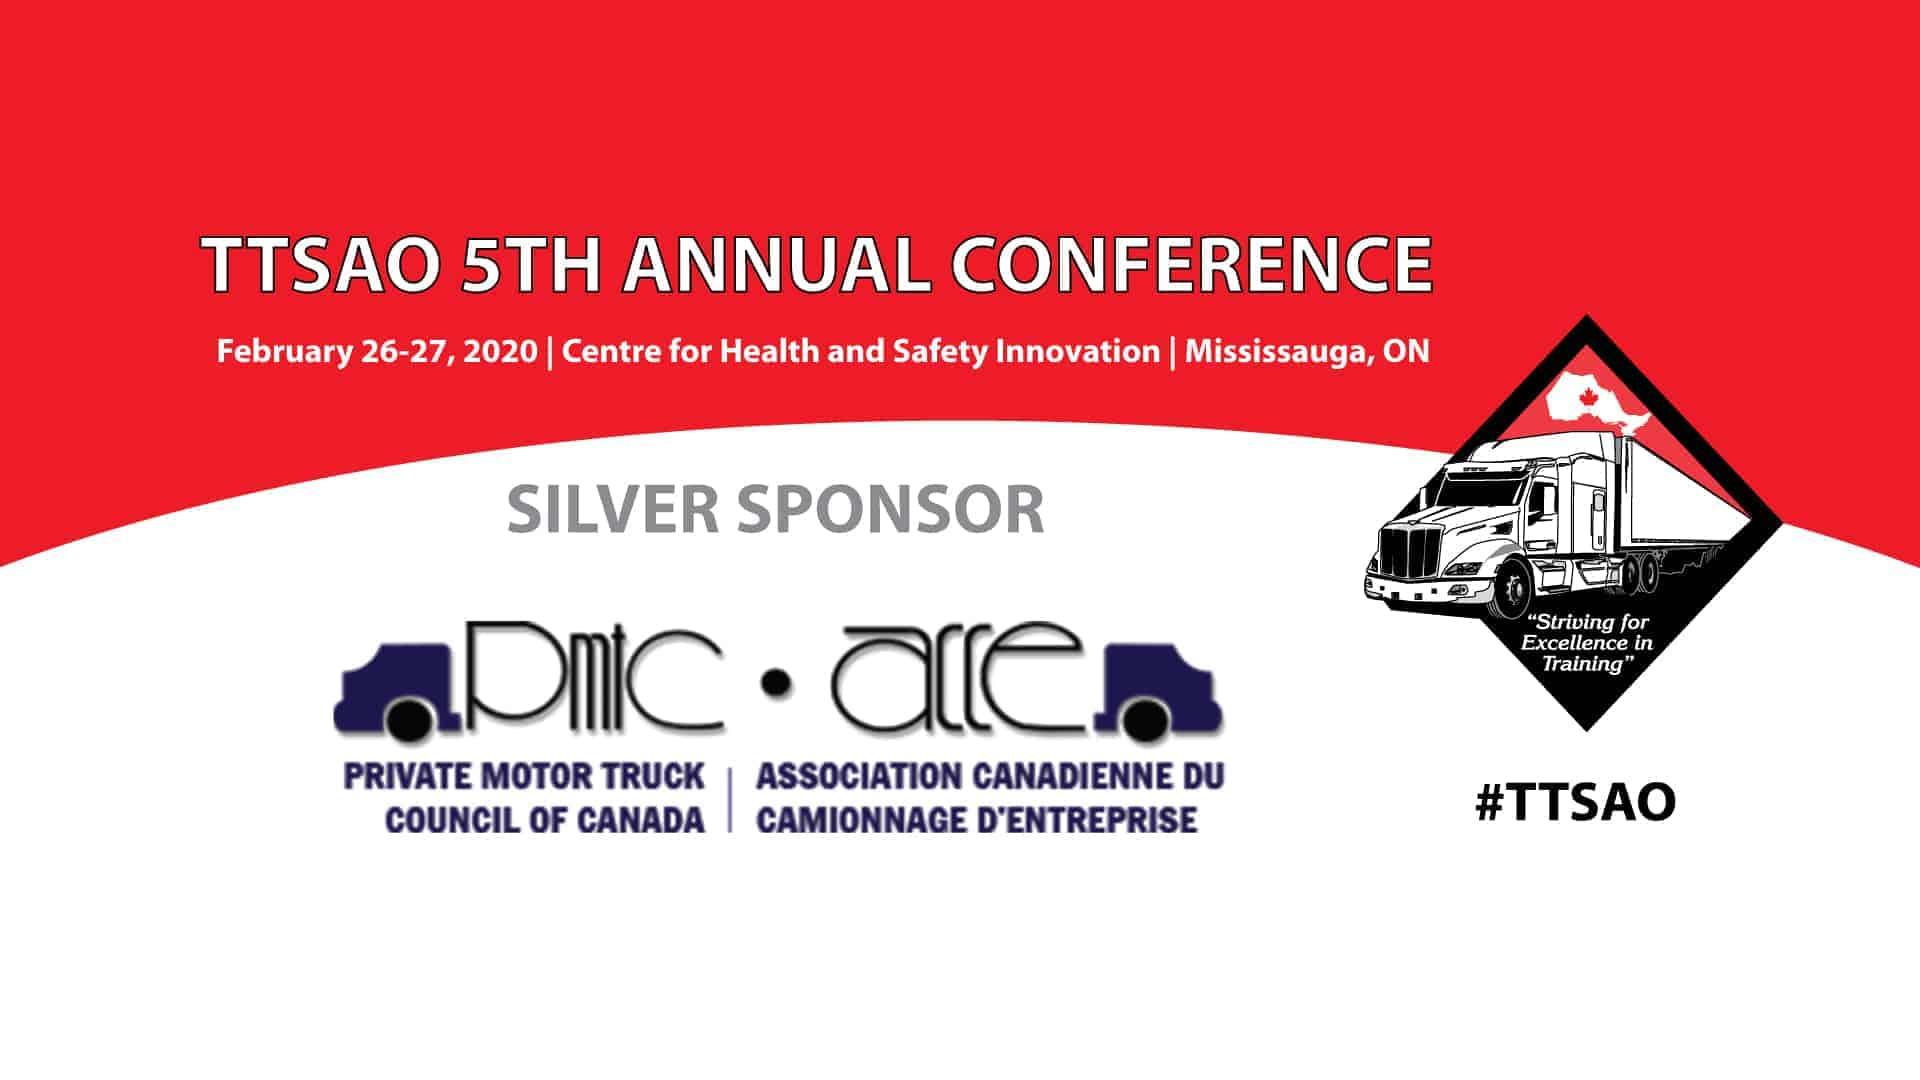 TTSAO-PMTC-Conference-graphic-template